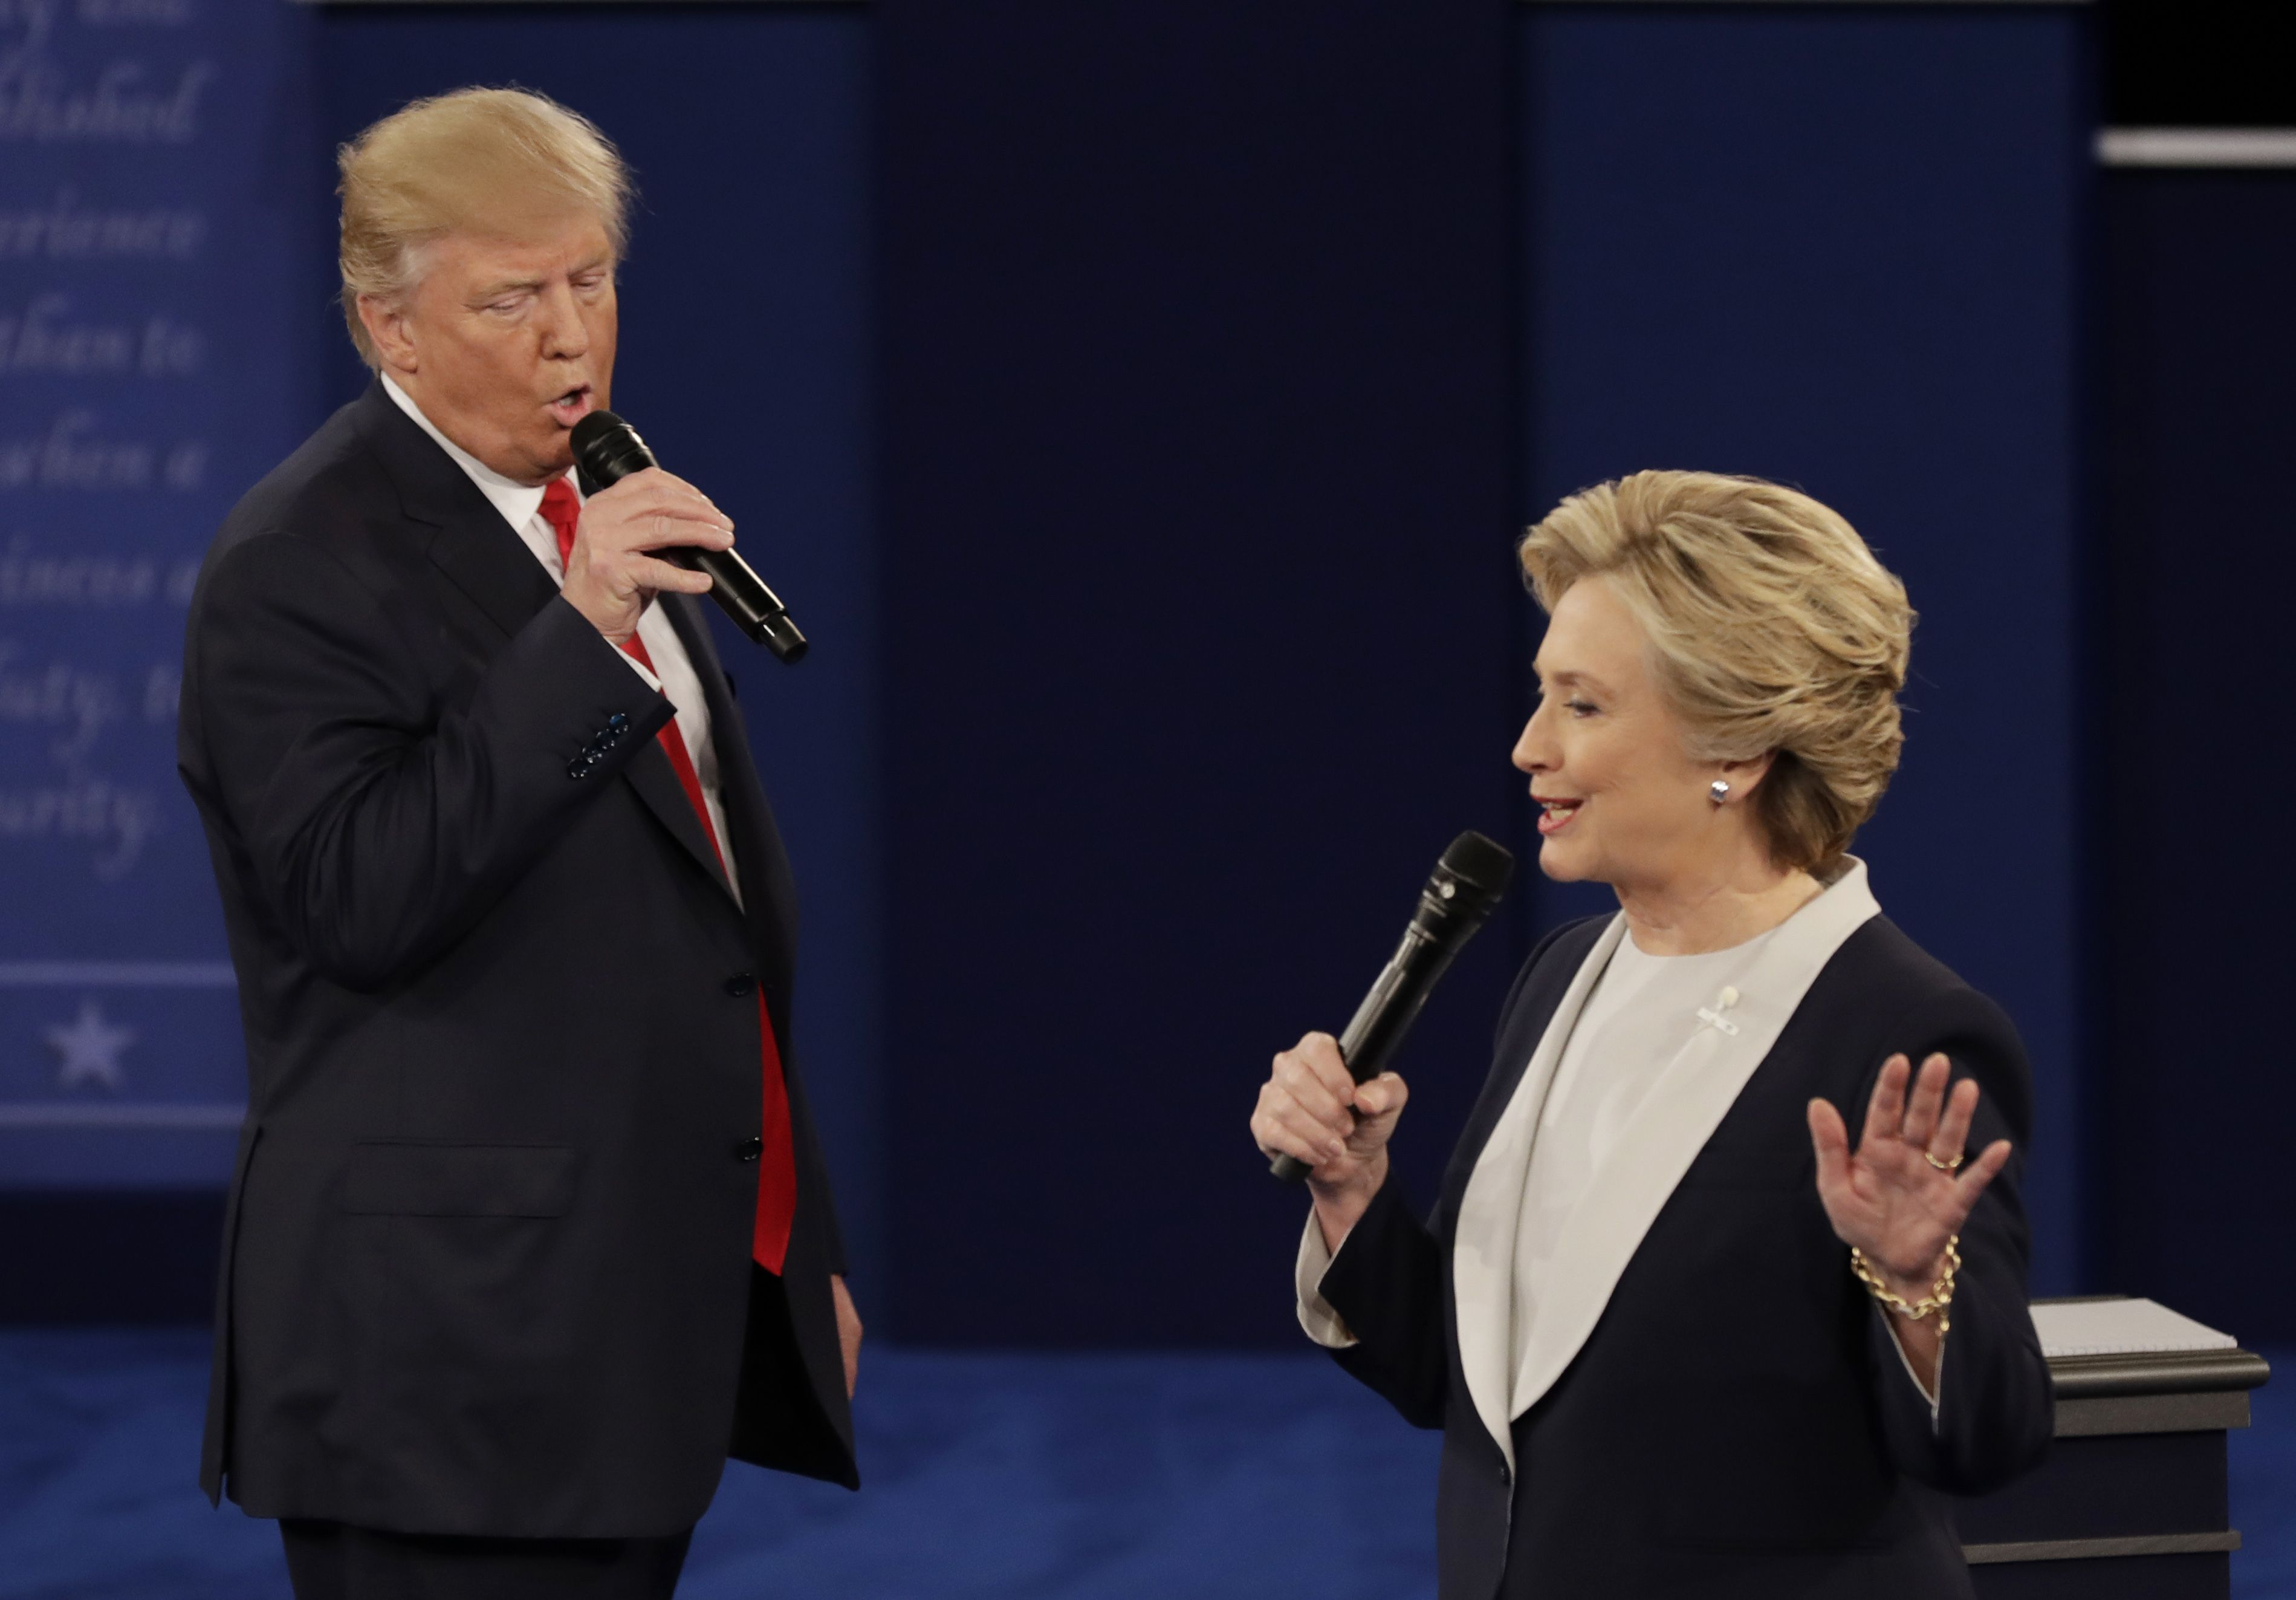 Presidential debate donald trump v hillary clinton read transcript